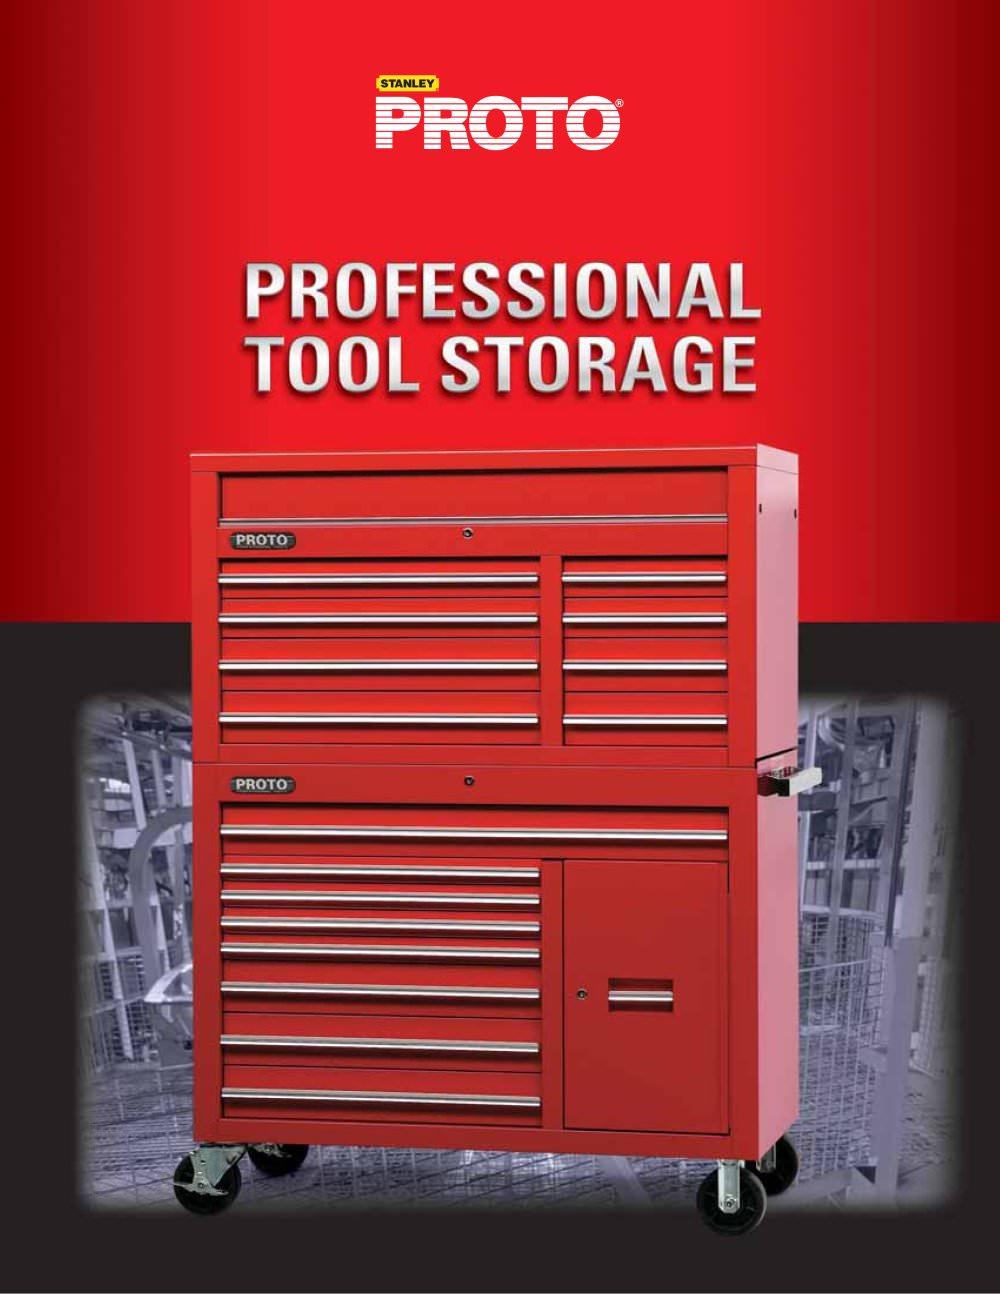 Proto® Professional Tool Storage - PROTO - PDF Catalogue ...